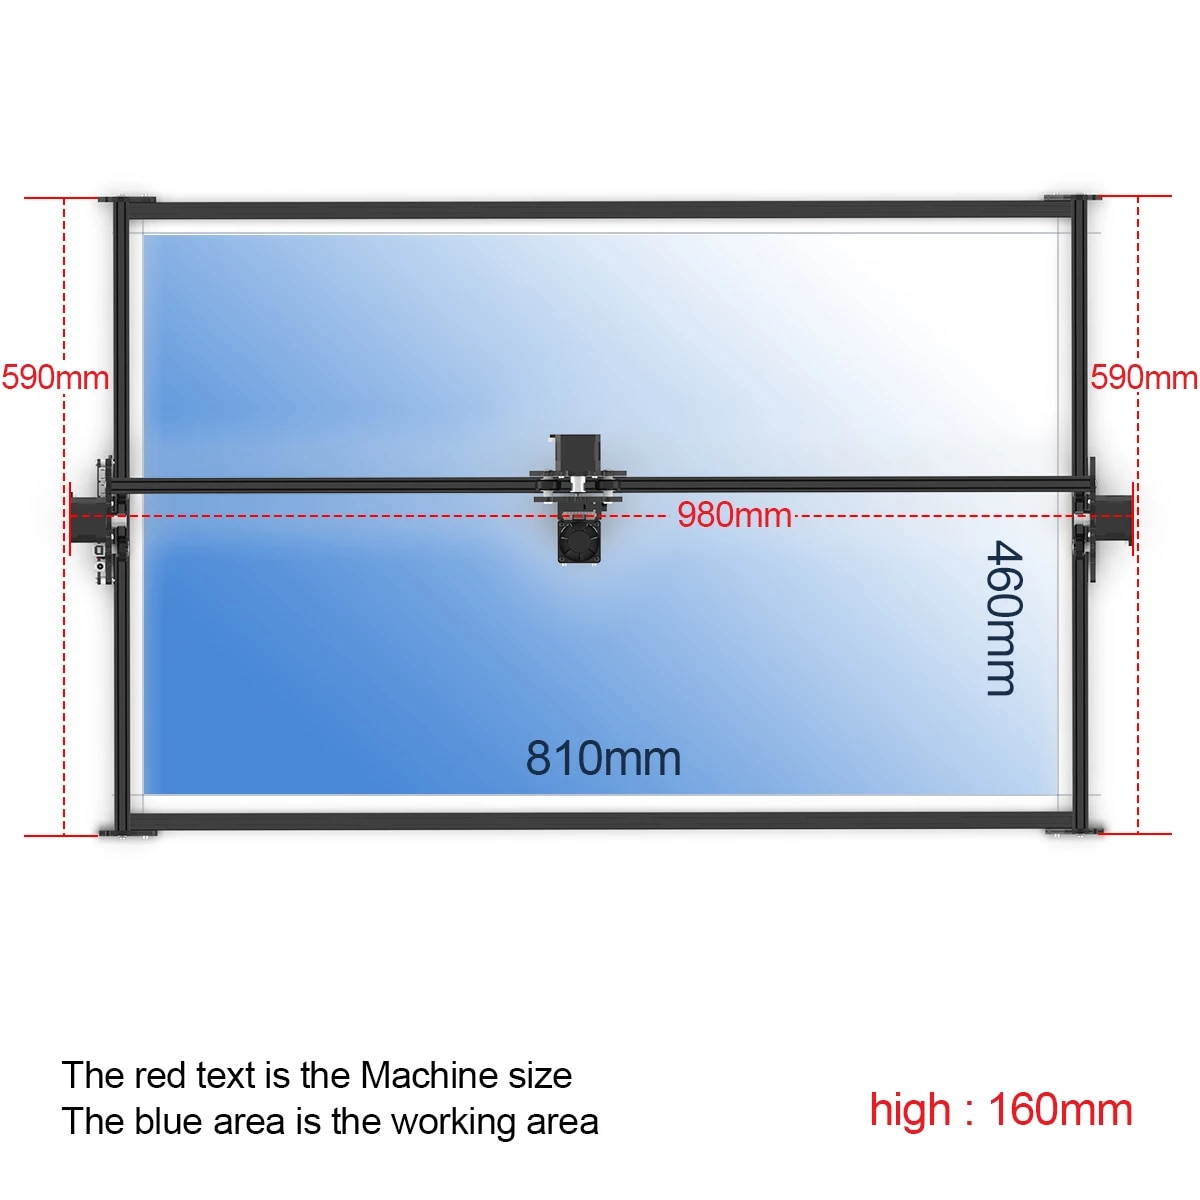 New NEJE Master 2S Max 50W A40630 Profession CNC Laser Engraving Machine Laser Cutter Engrave Metal with App Control Lightburn enlarge